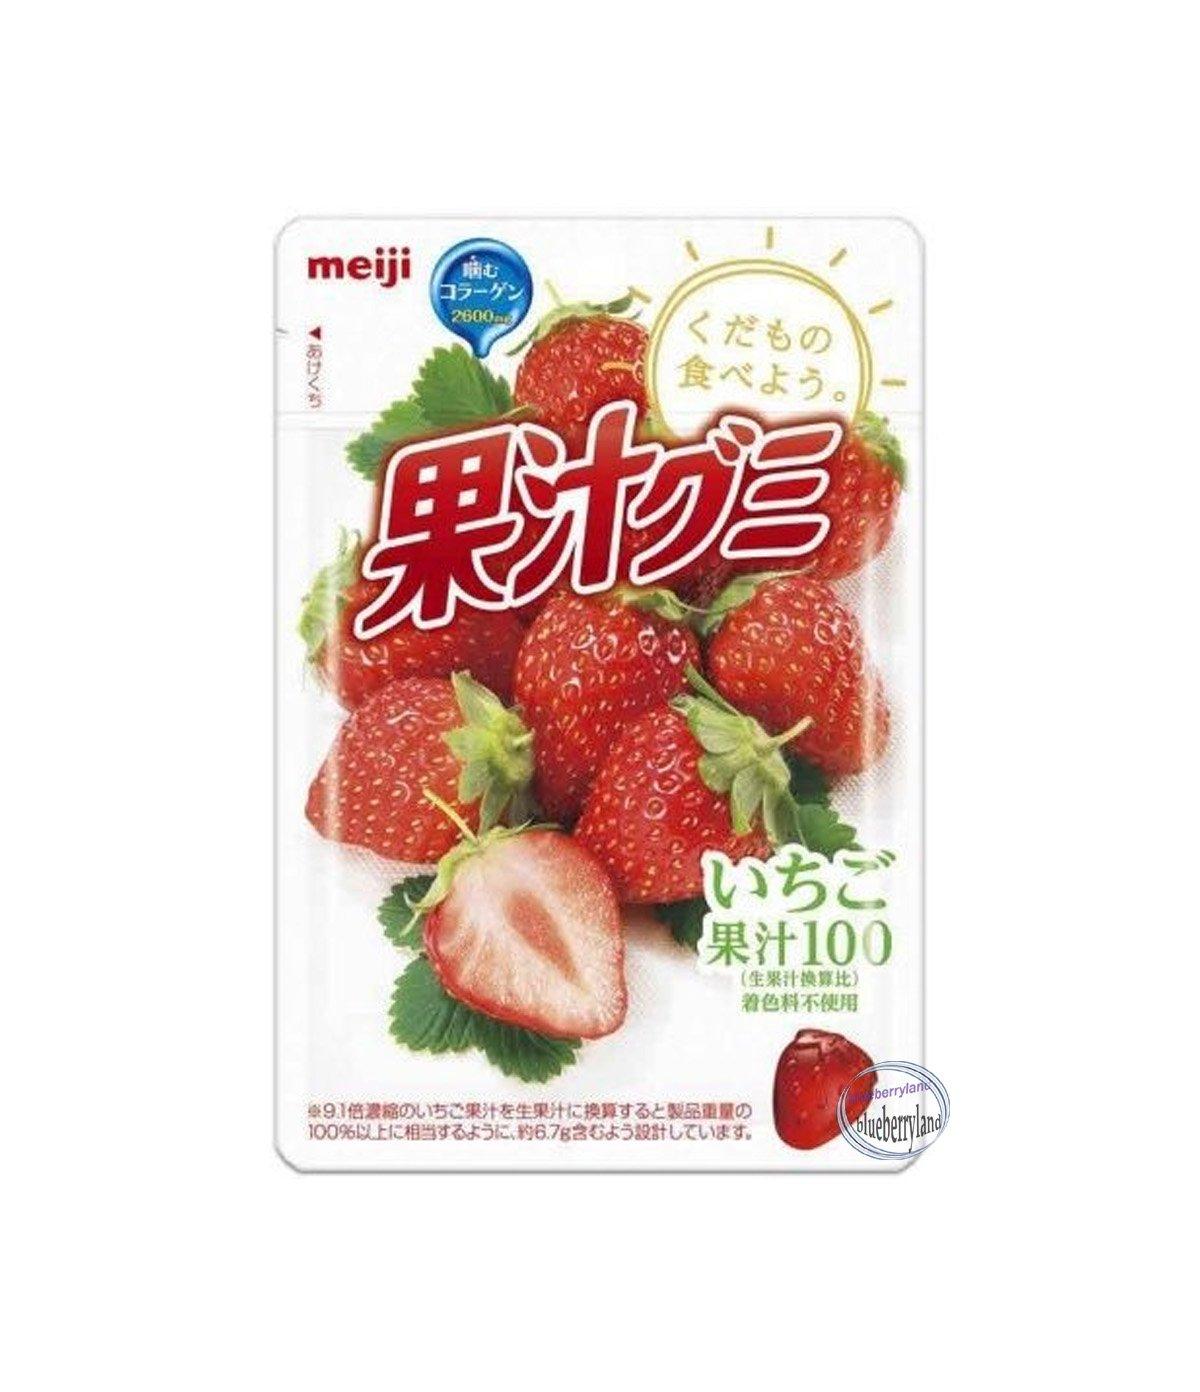 Japan Meiji Strawberry Flavor Fruit Juice Gummy Collagen sweet snack candy gummy